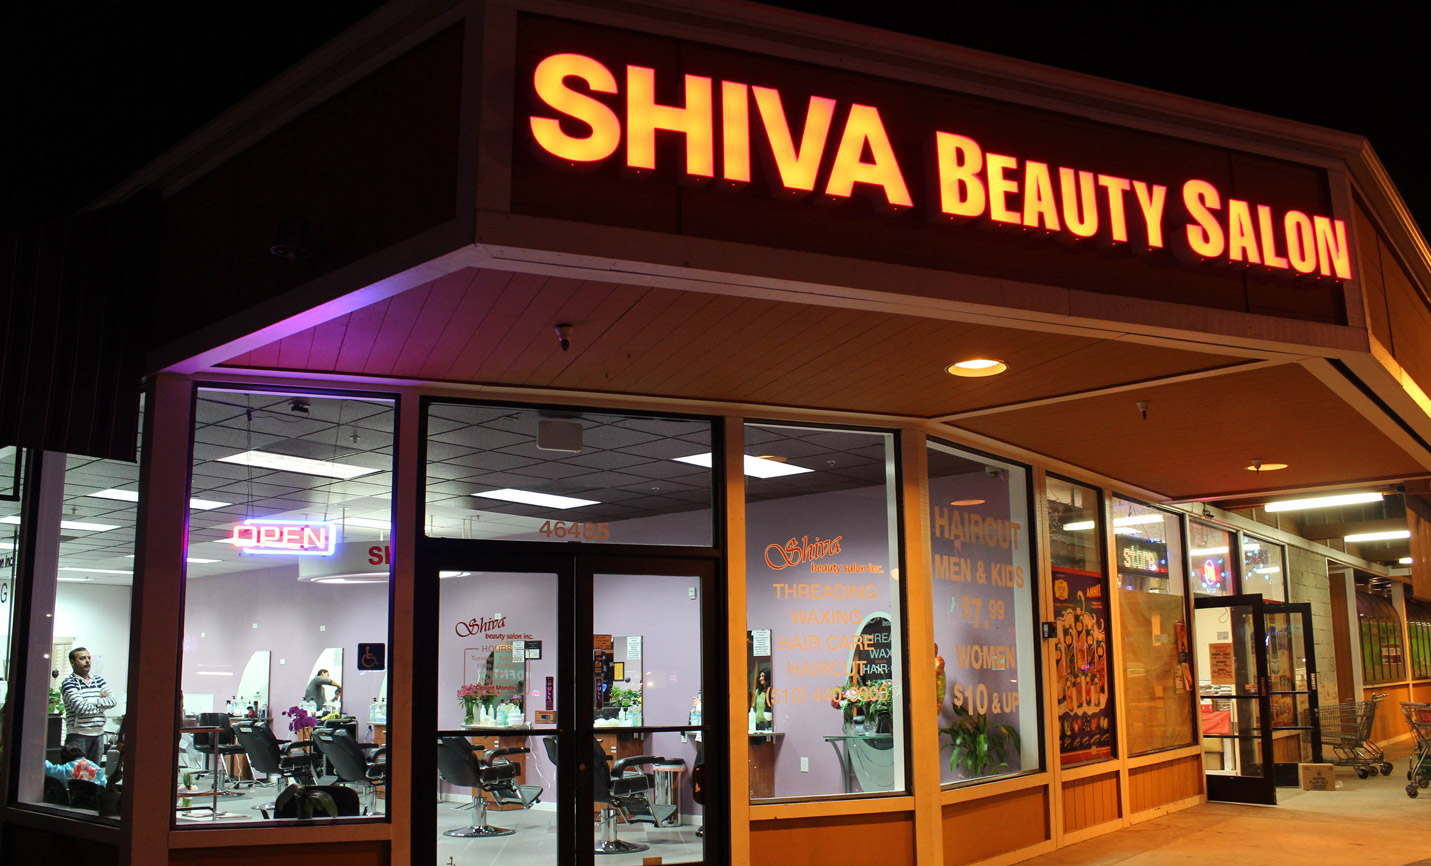 Shiva Beauty Salon Inc